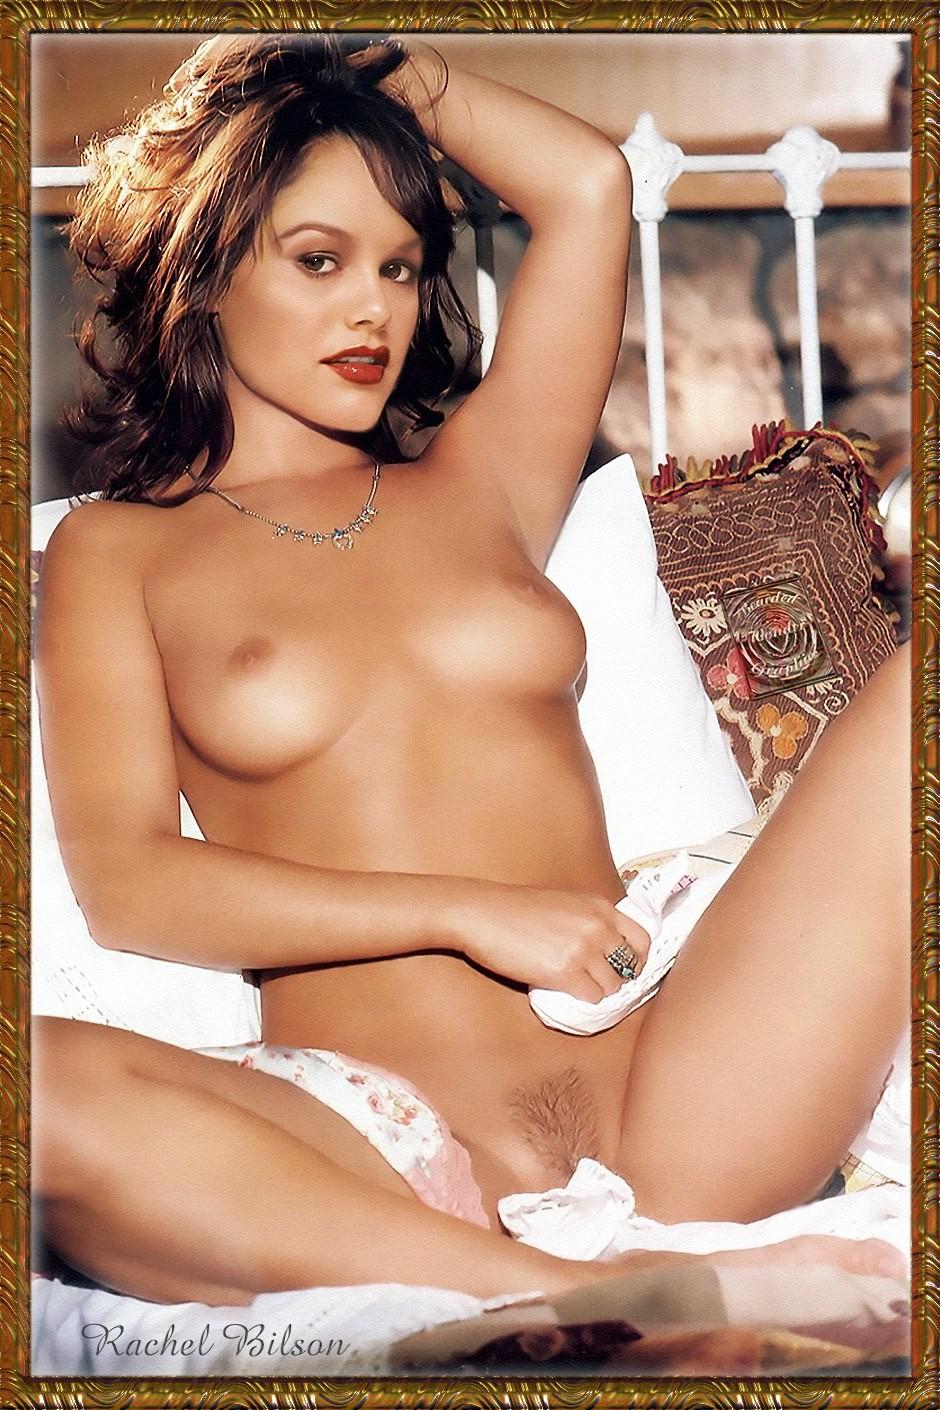 Rachel Bilson Nude Fakes